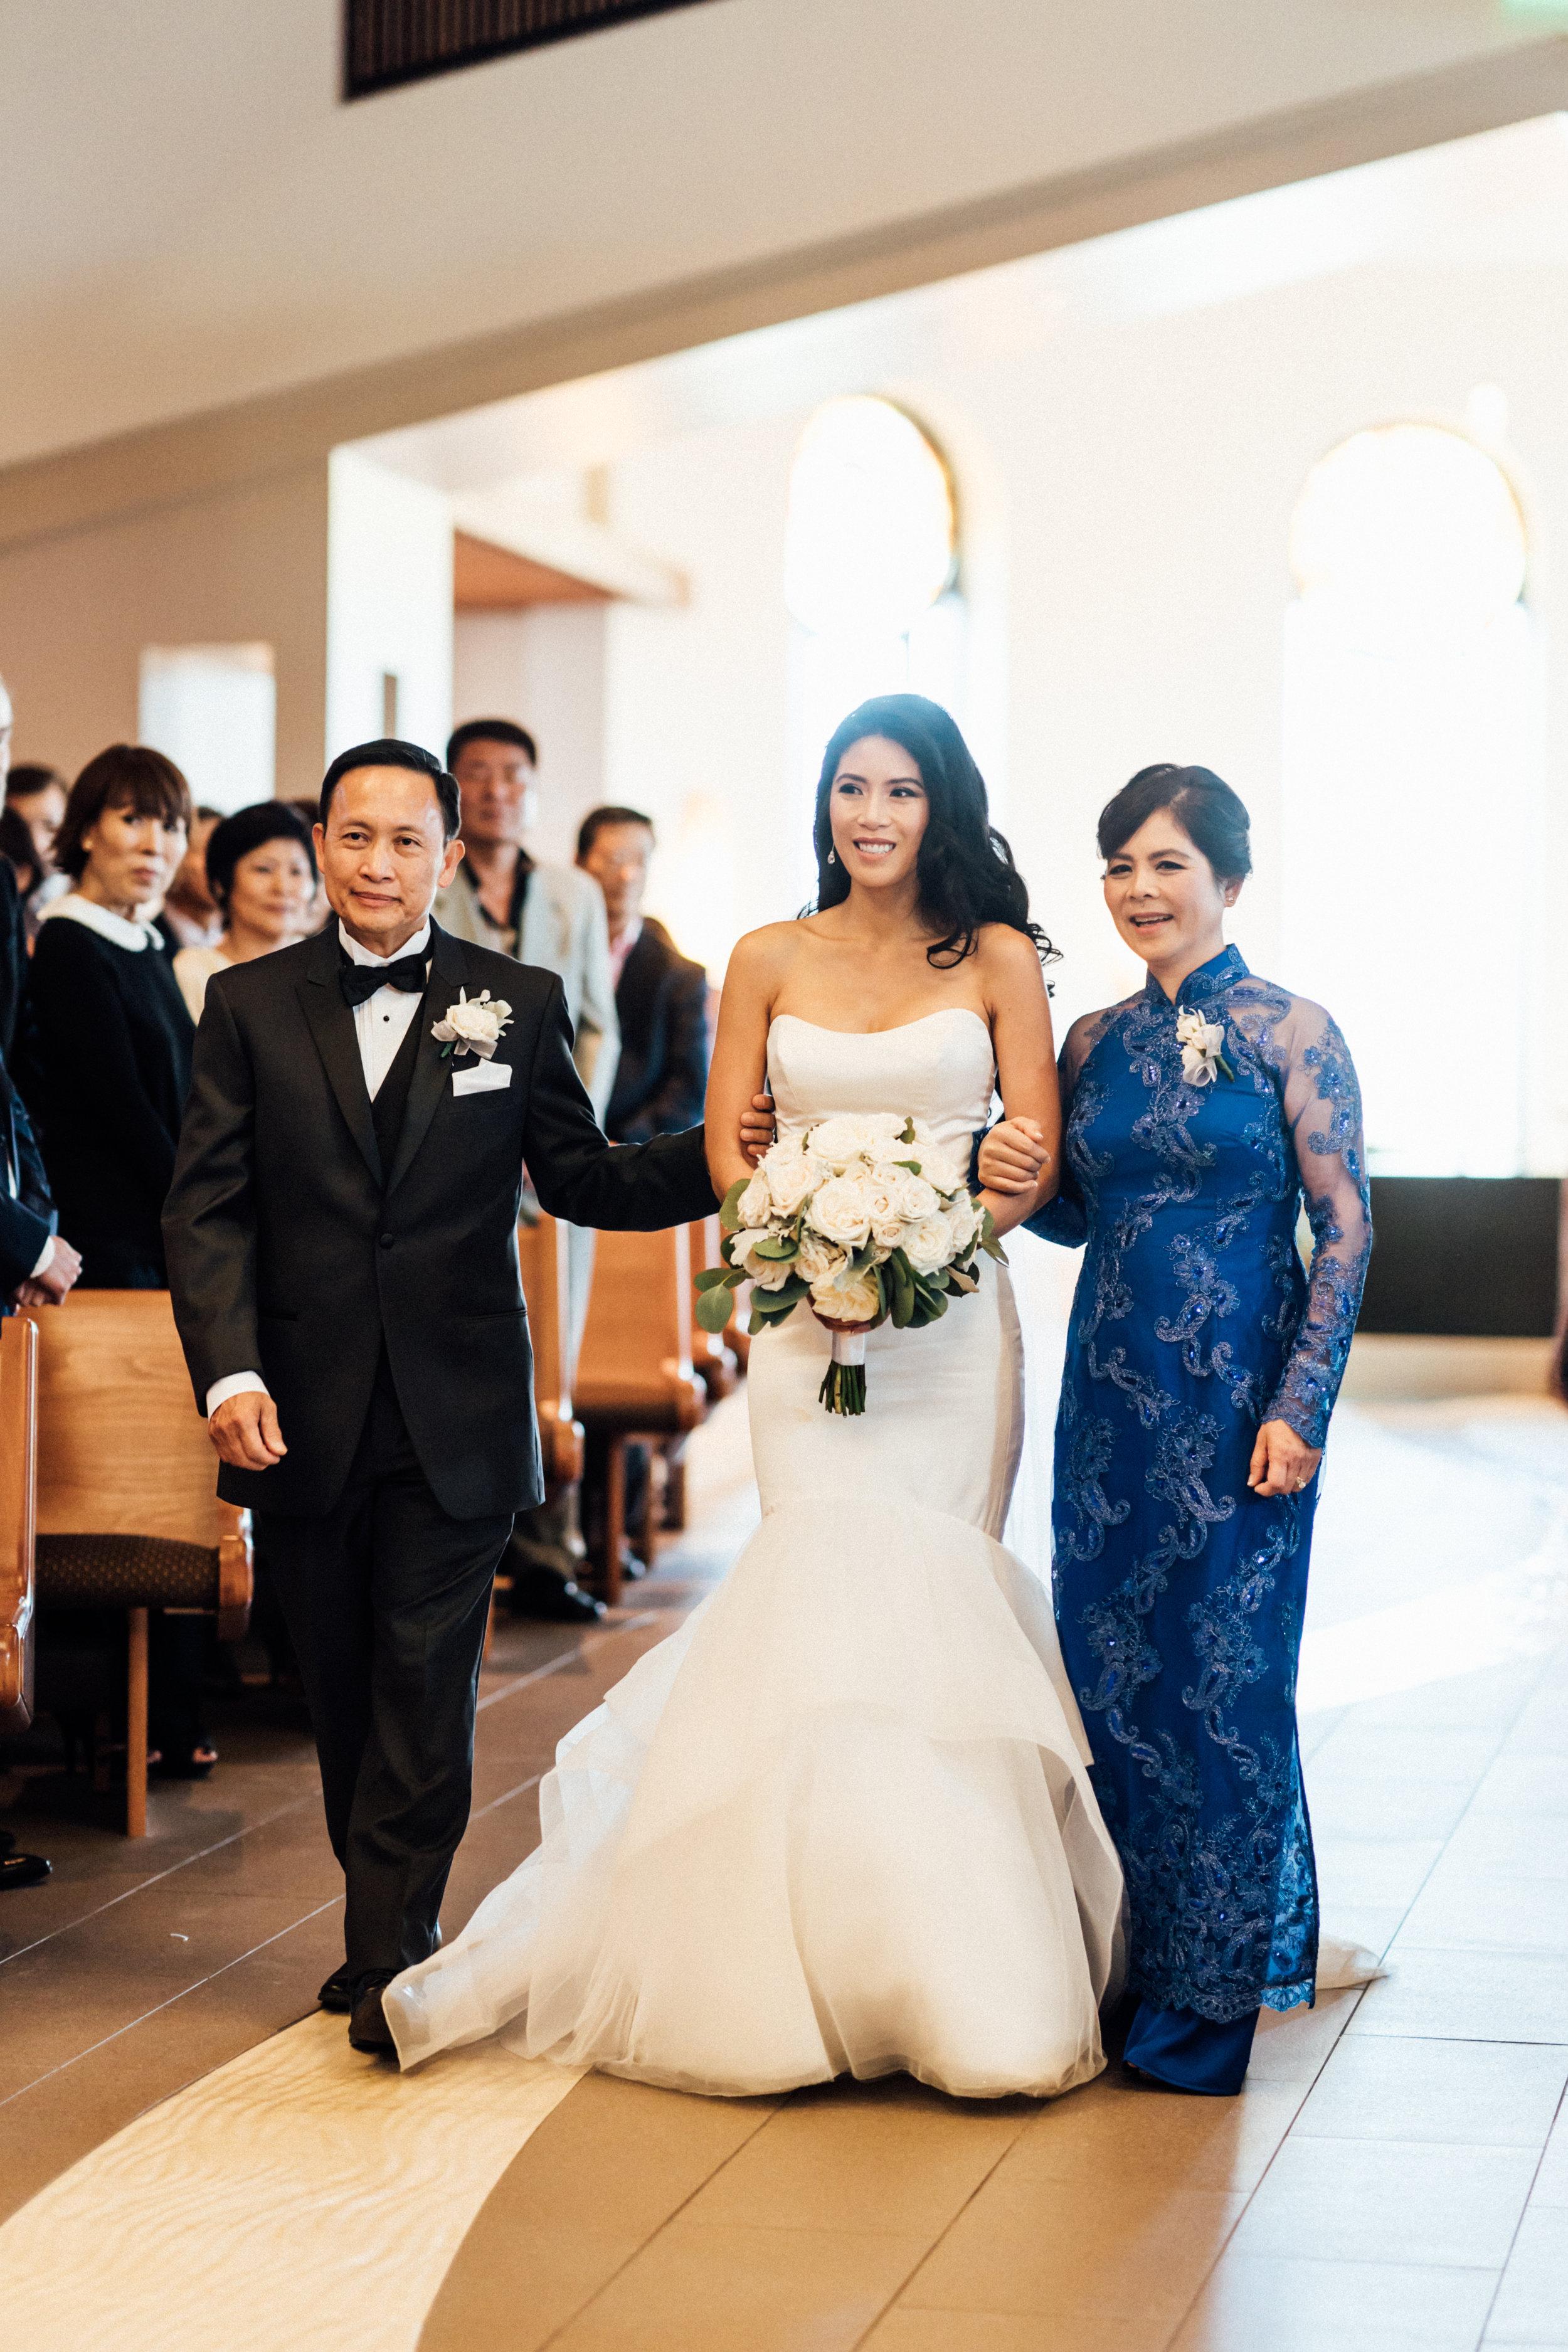 410 Anna _ Danny Wedding SUP07494.jpg